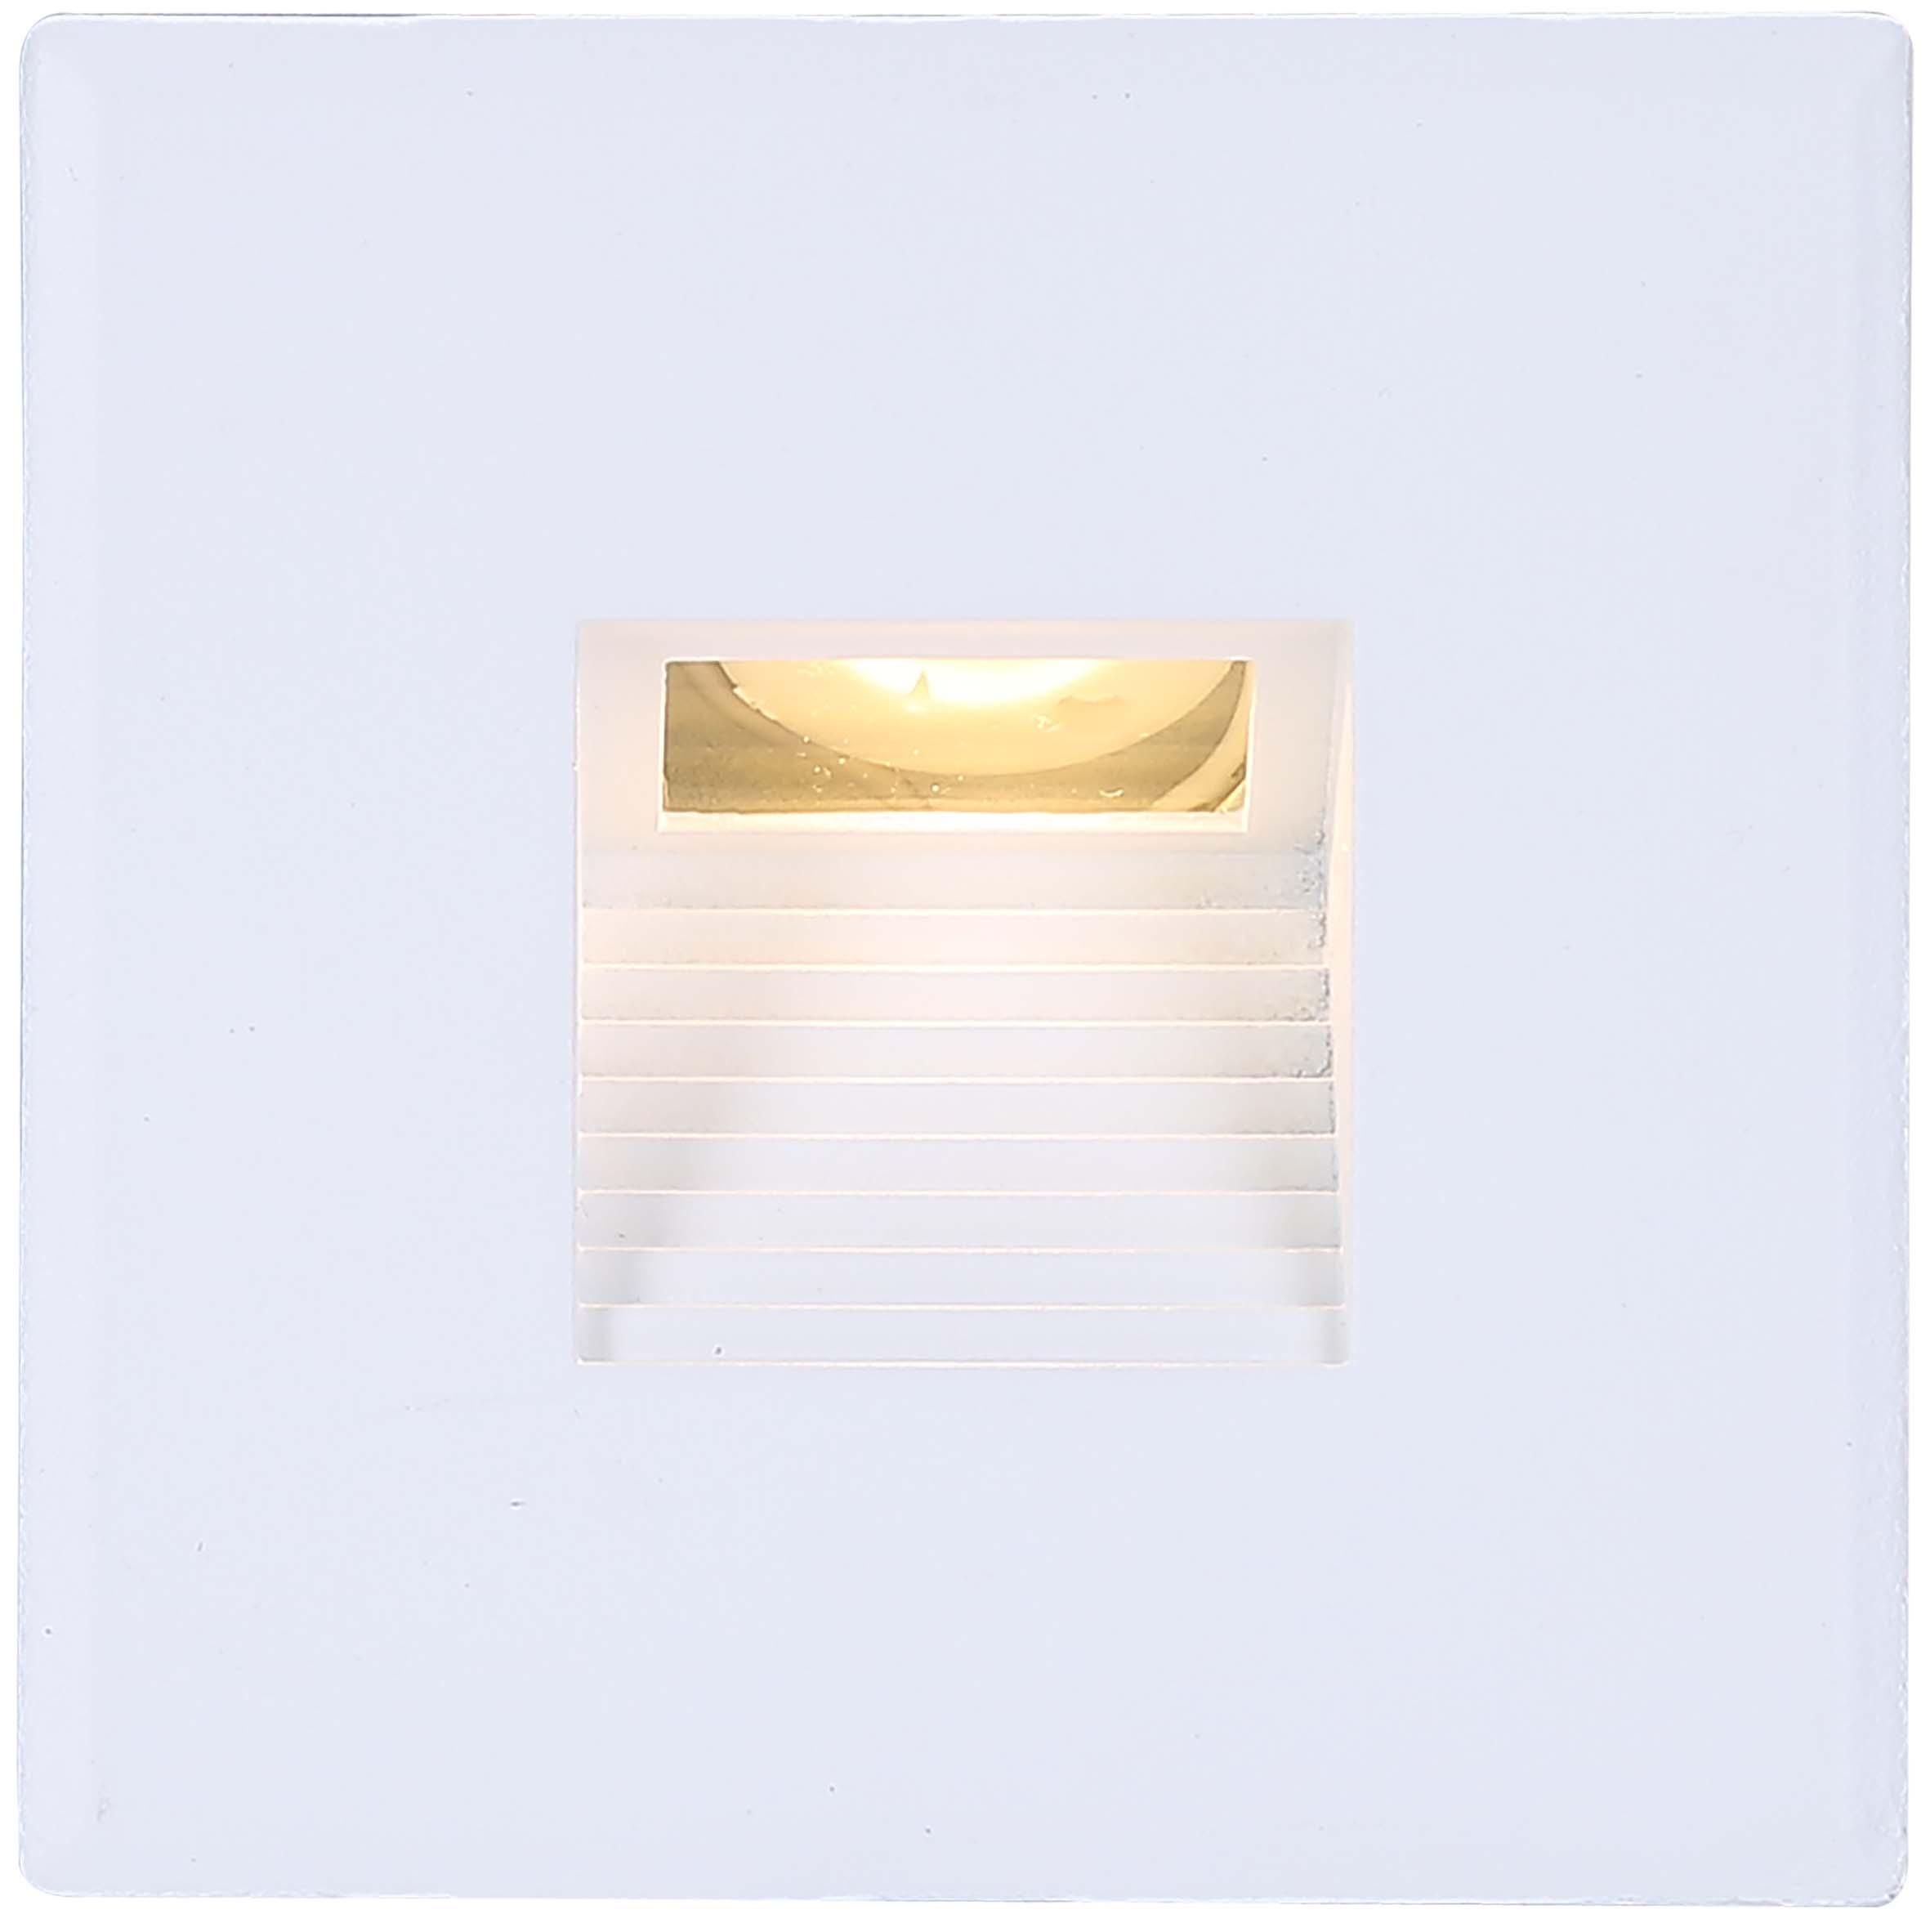 LHT1151_-_Steplight_-_Square_White_Tier_%28light_ON%29